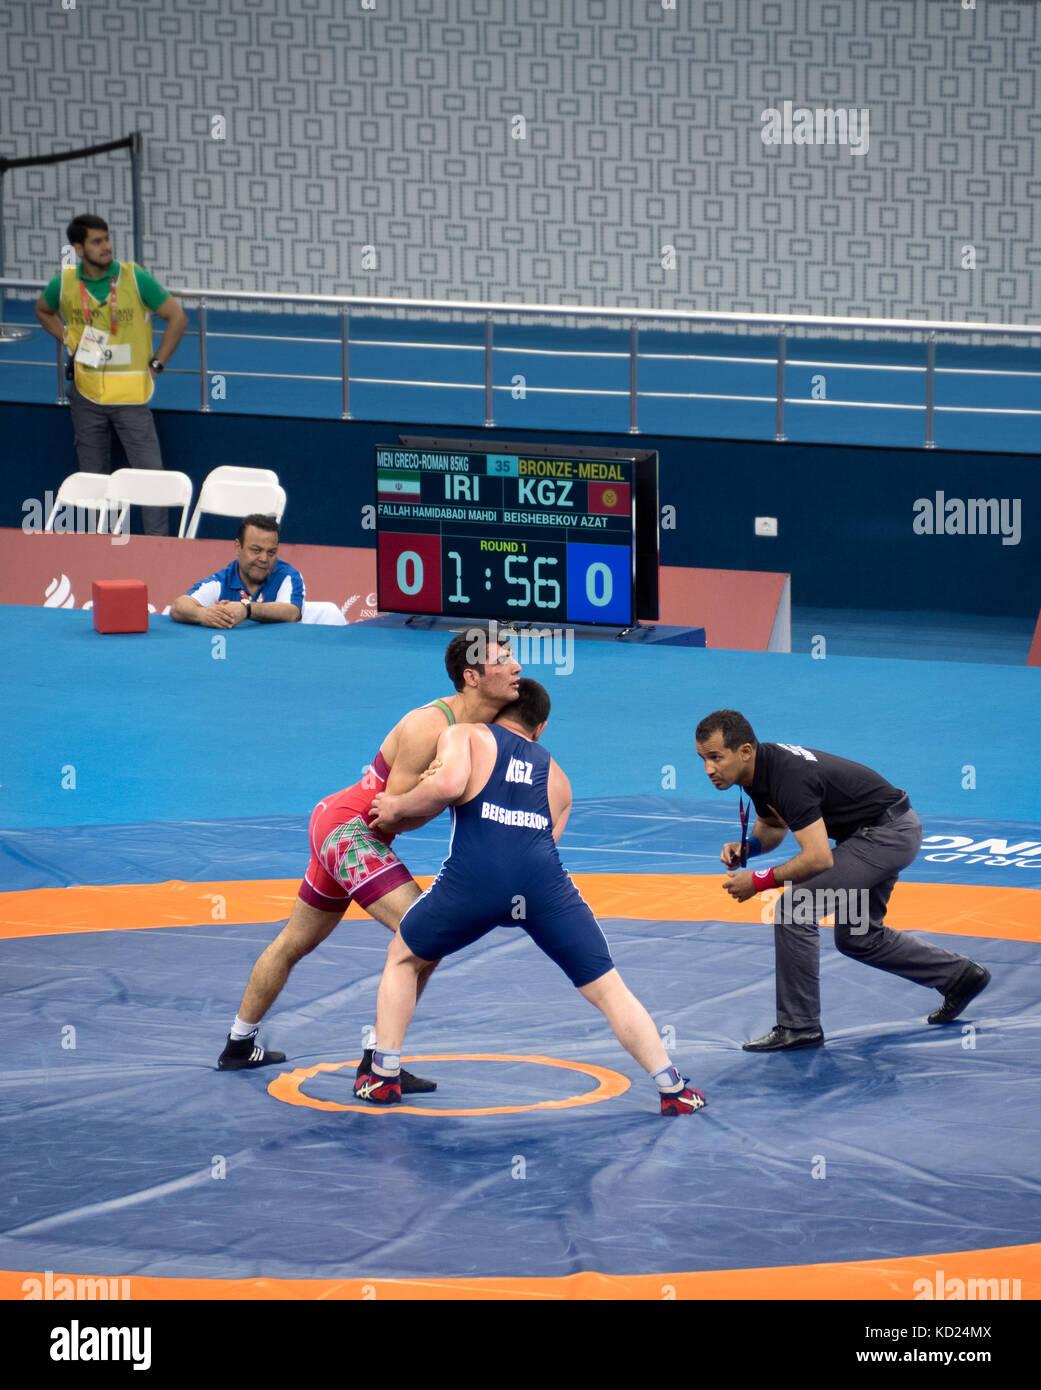 Baku, Azerbaijan - May 18, 2017 : Men's Greco Roman wrestling 85kg bronze medal final at 4th Islamic Solidarity - Stock Image